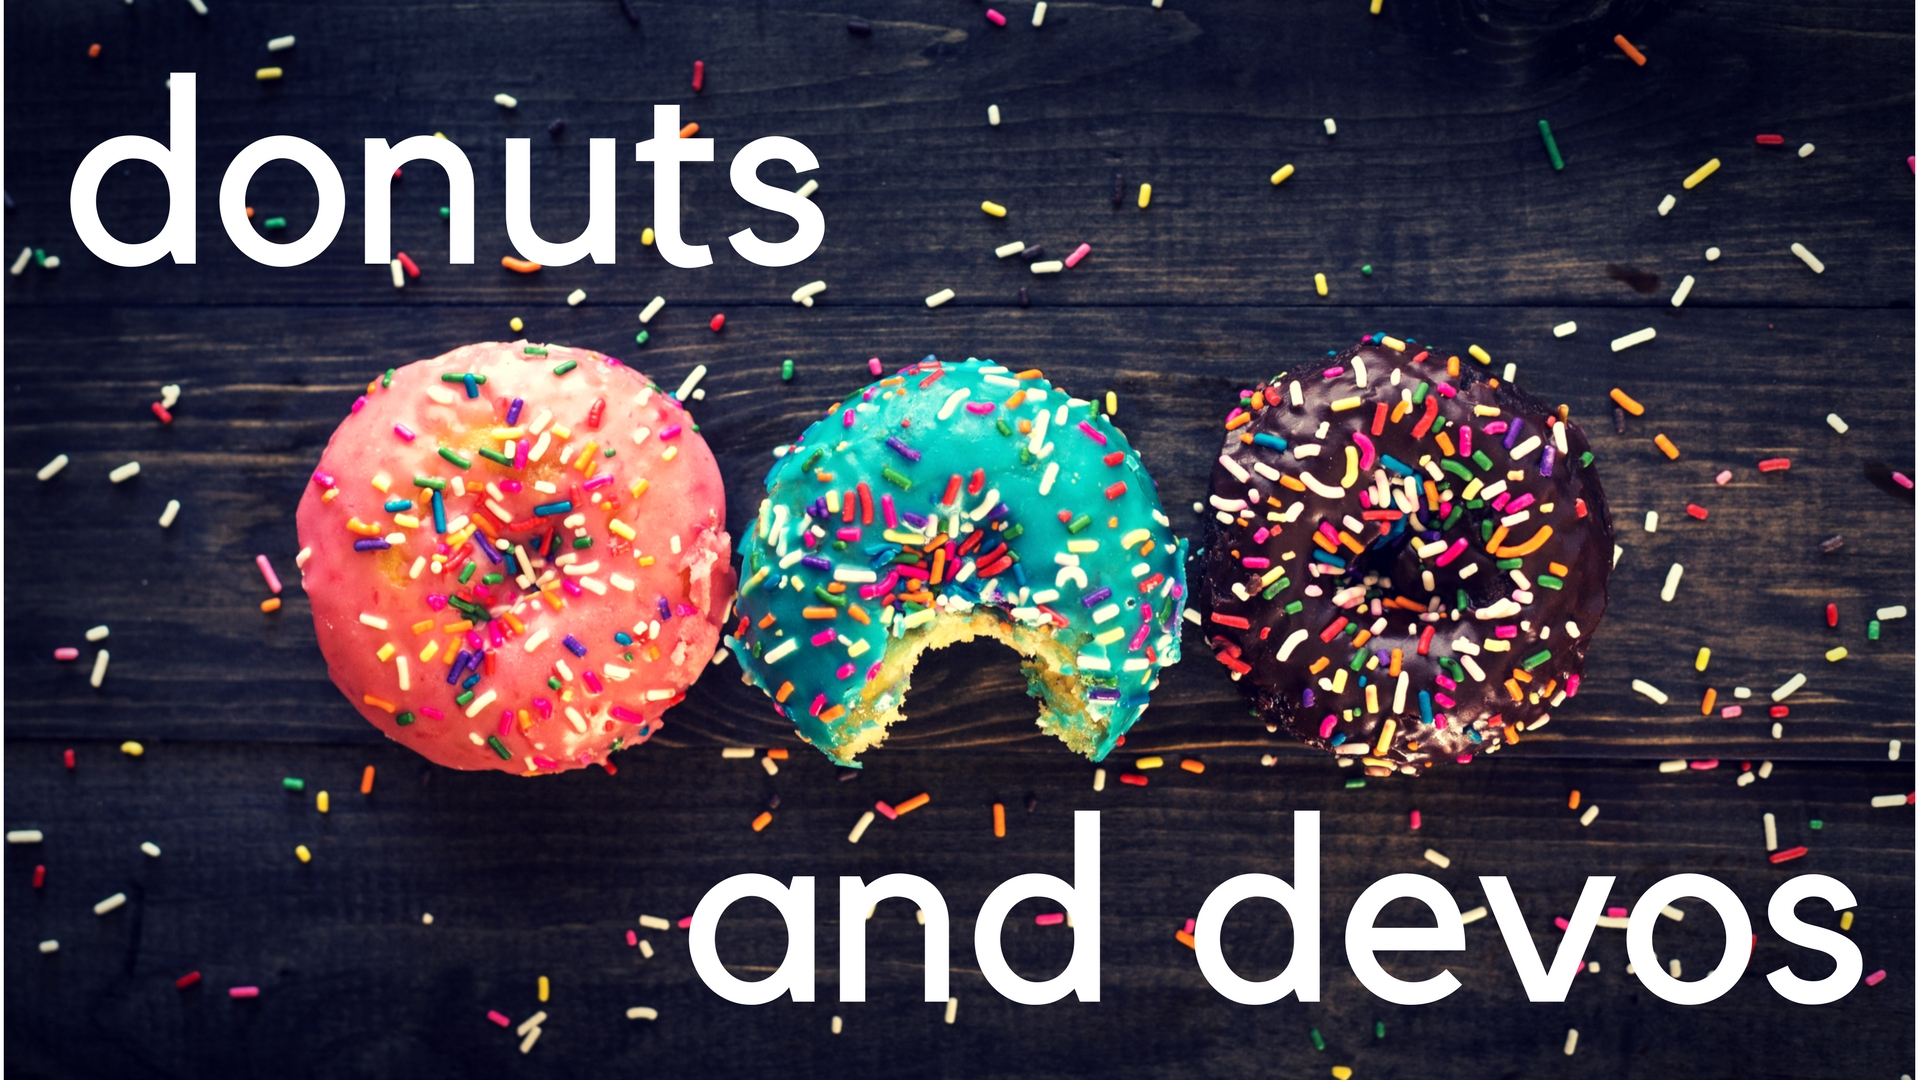 donuts & devos.jpg